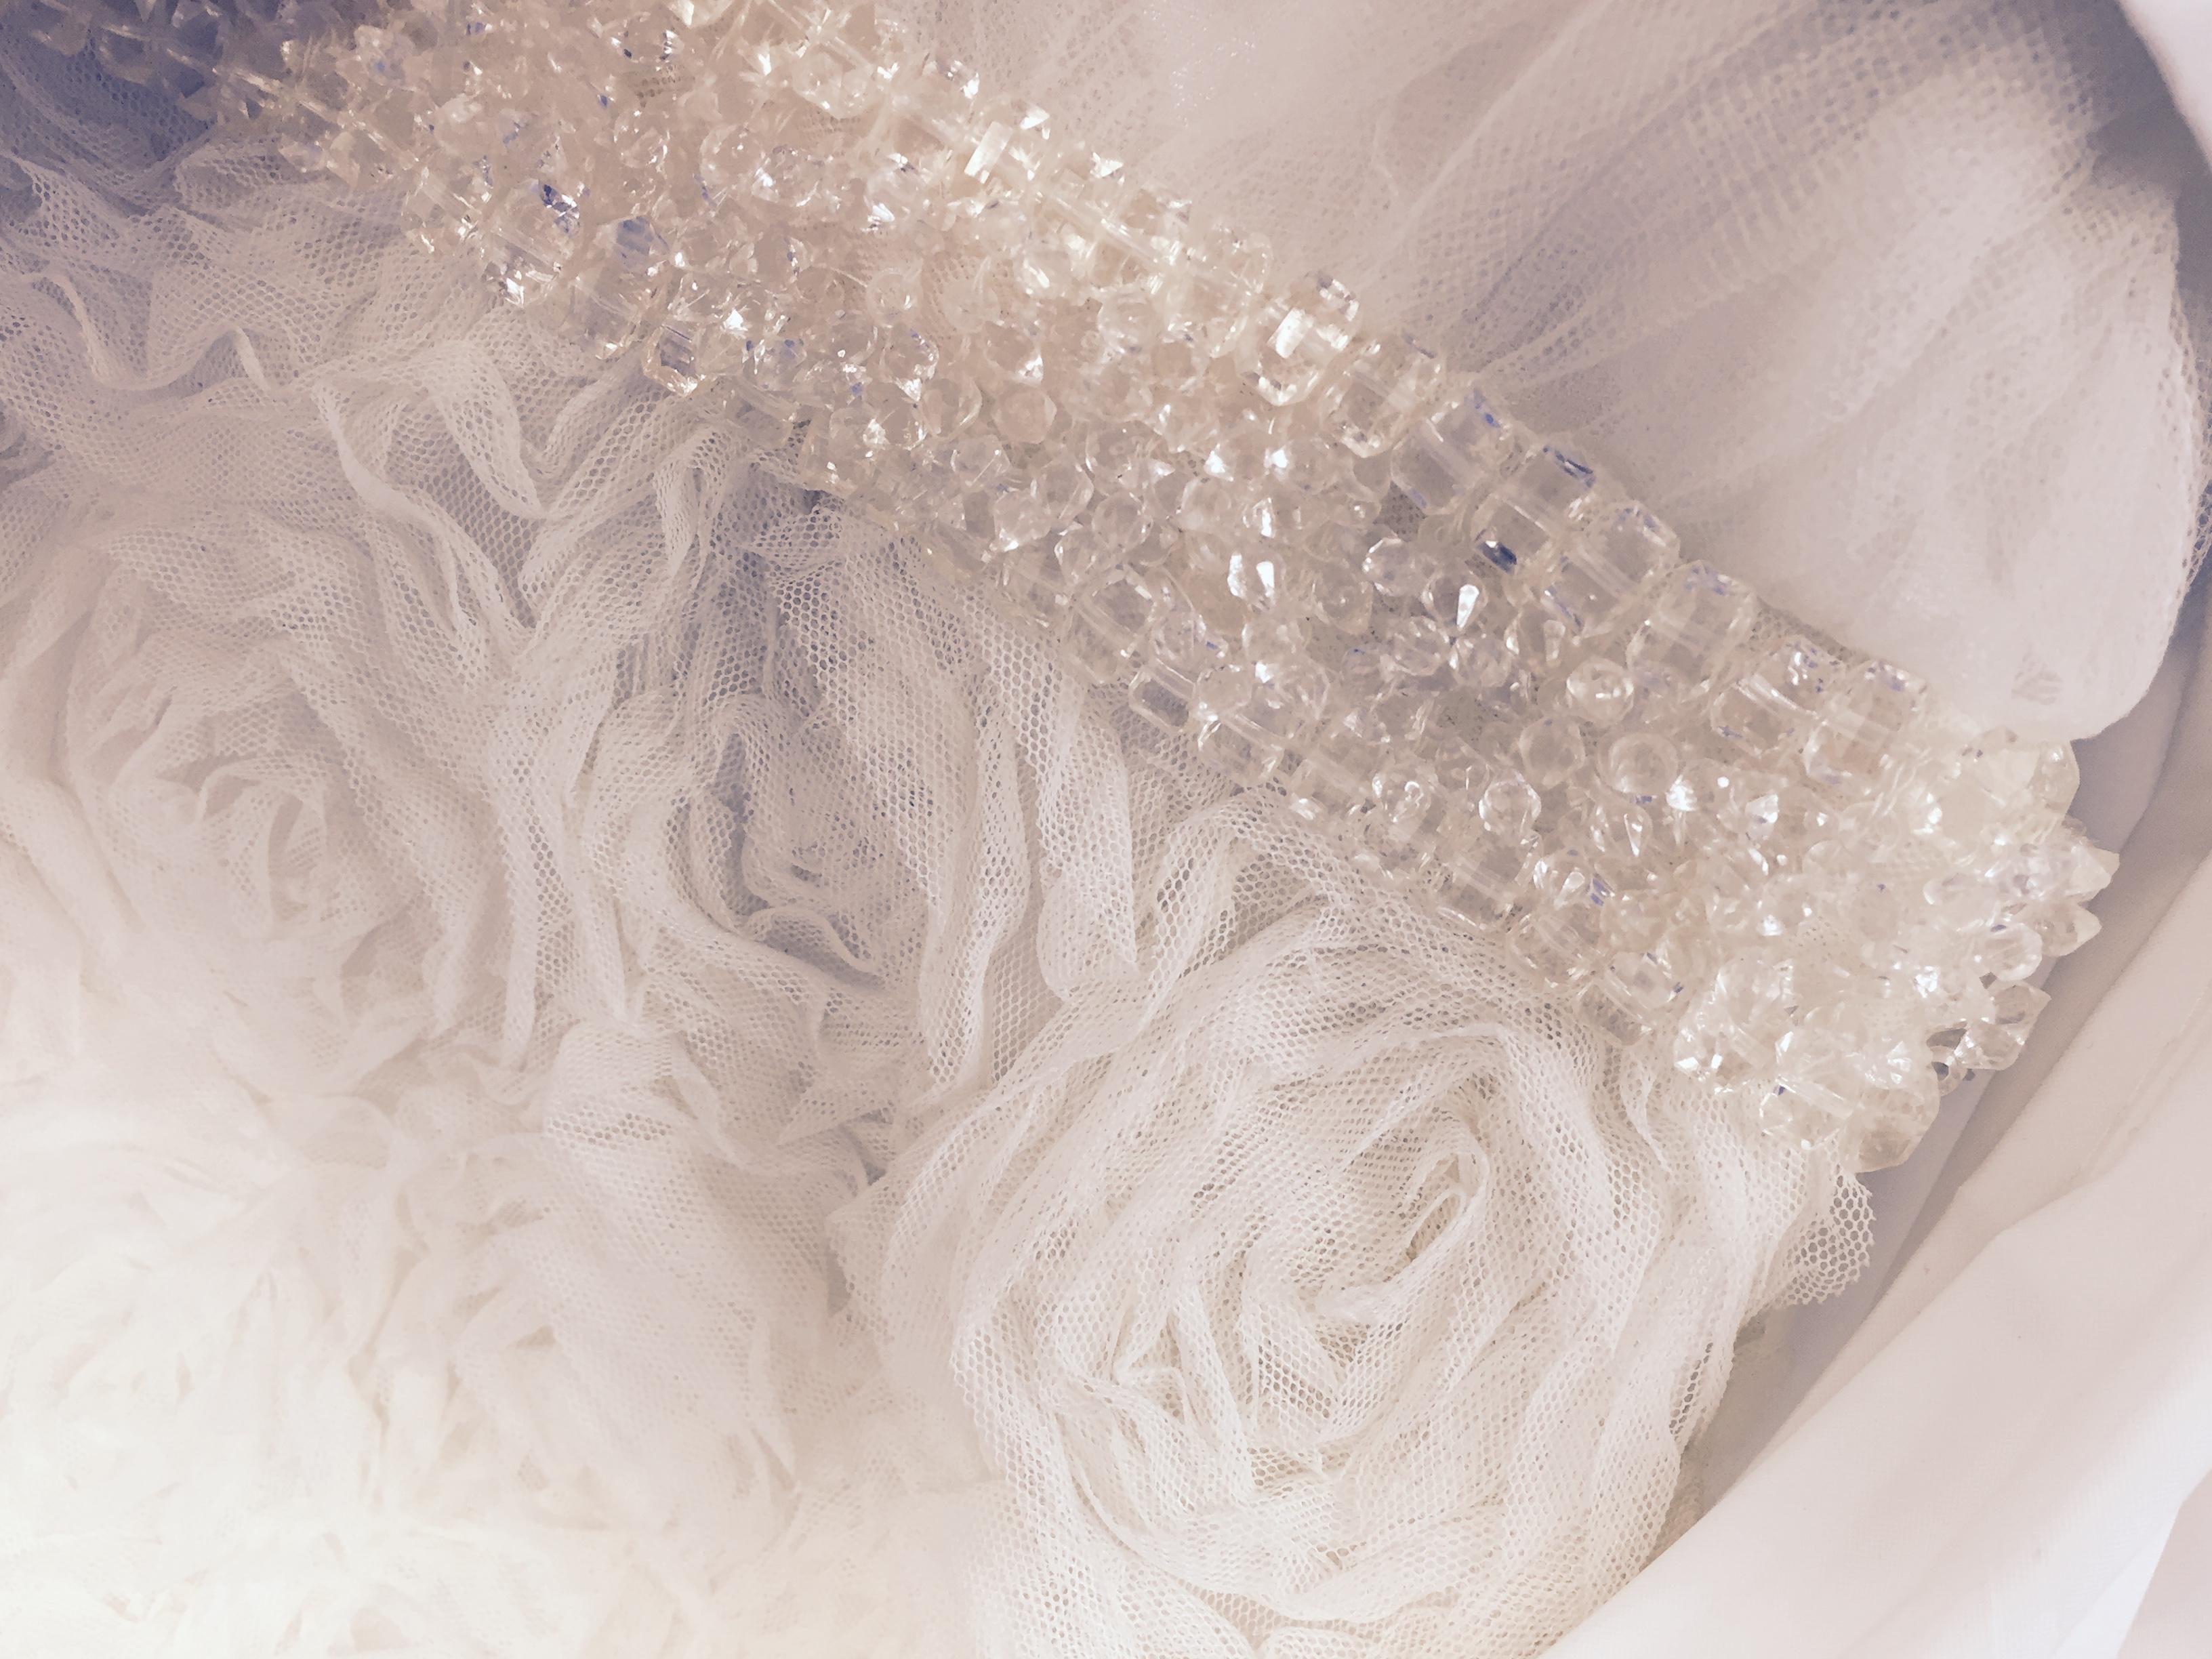 Bridal Alteration Costs - Bride & Alter